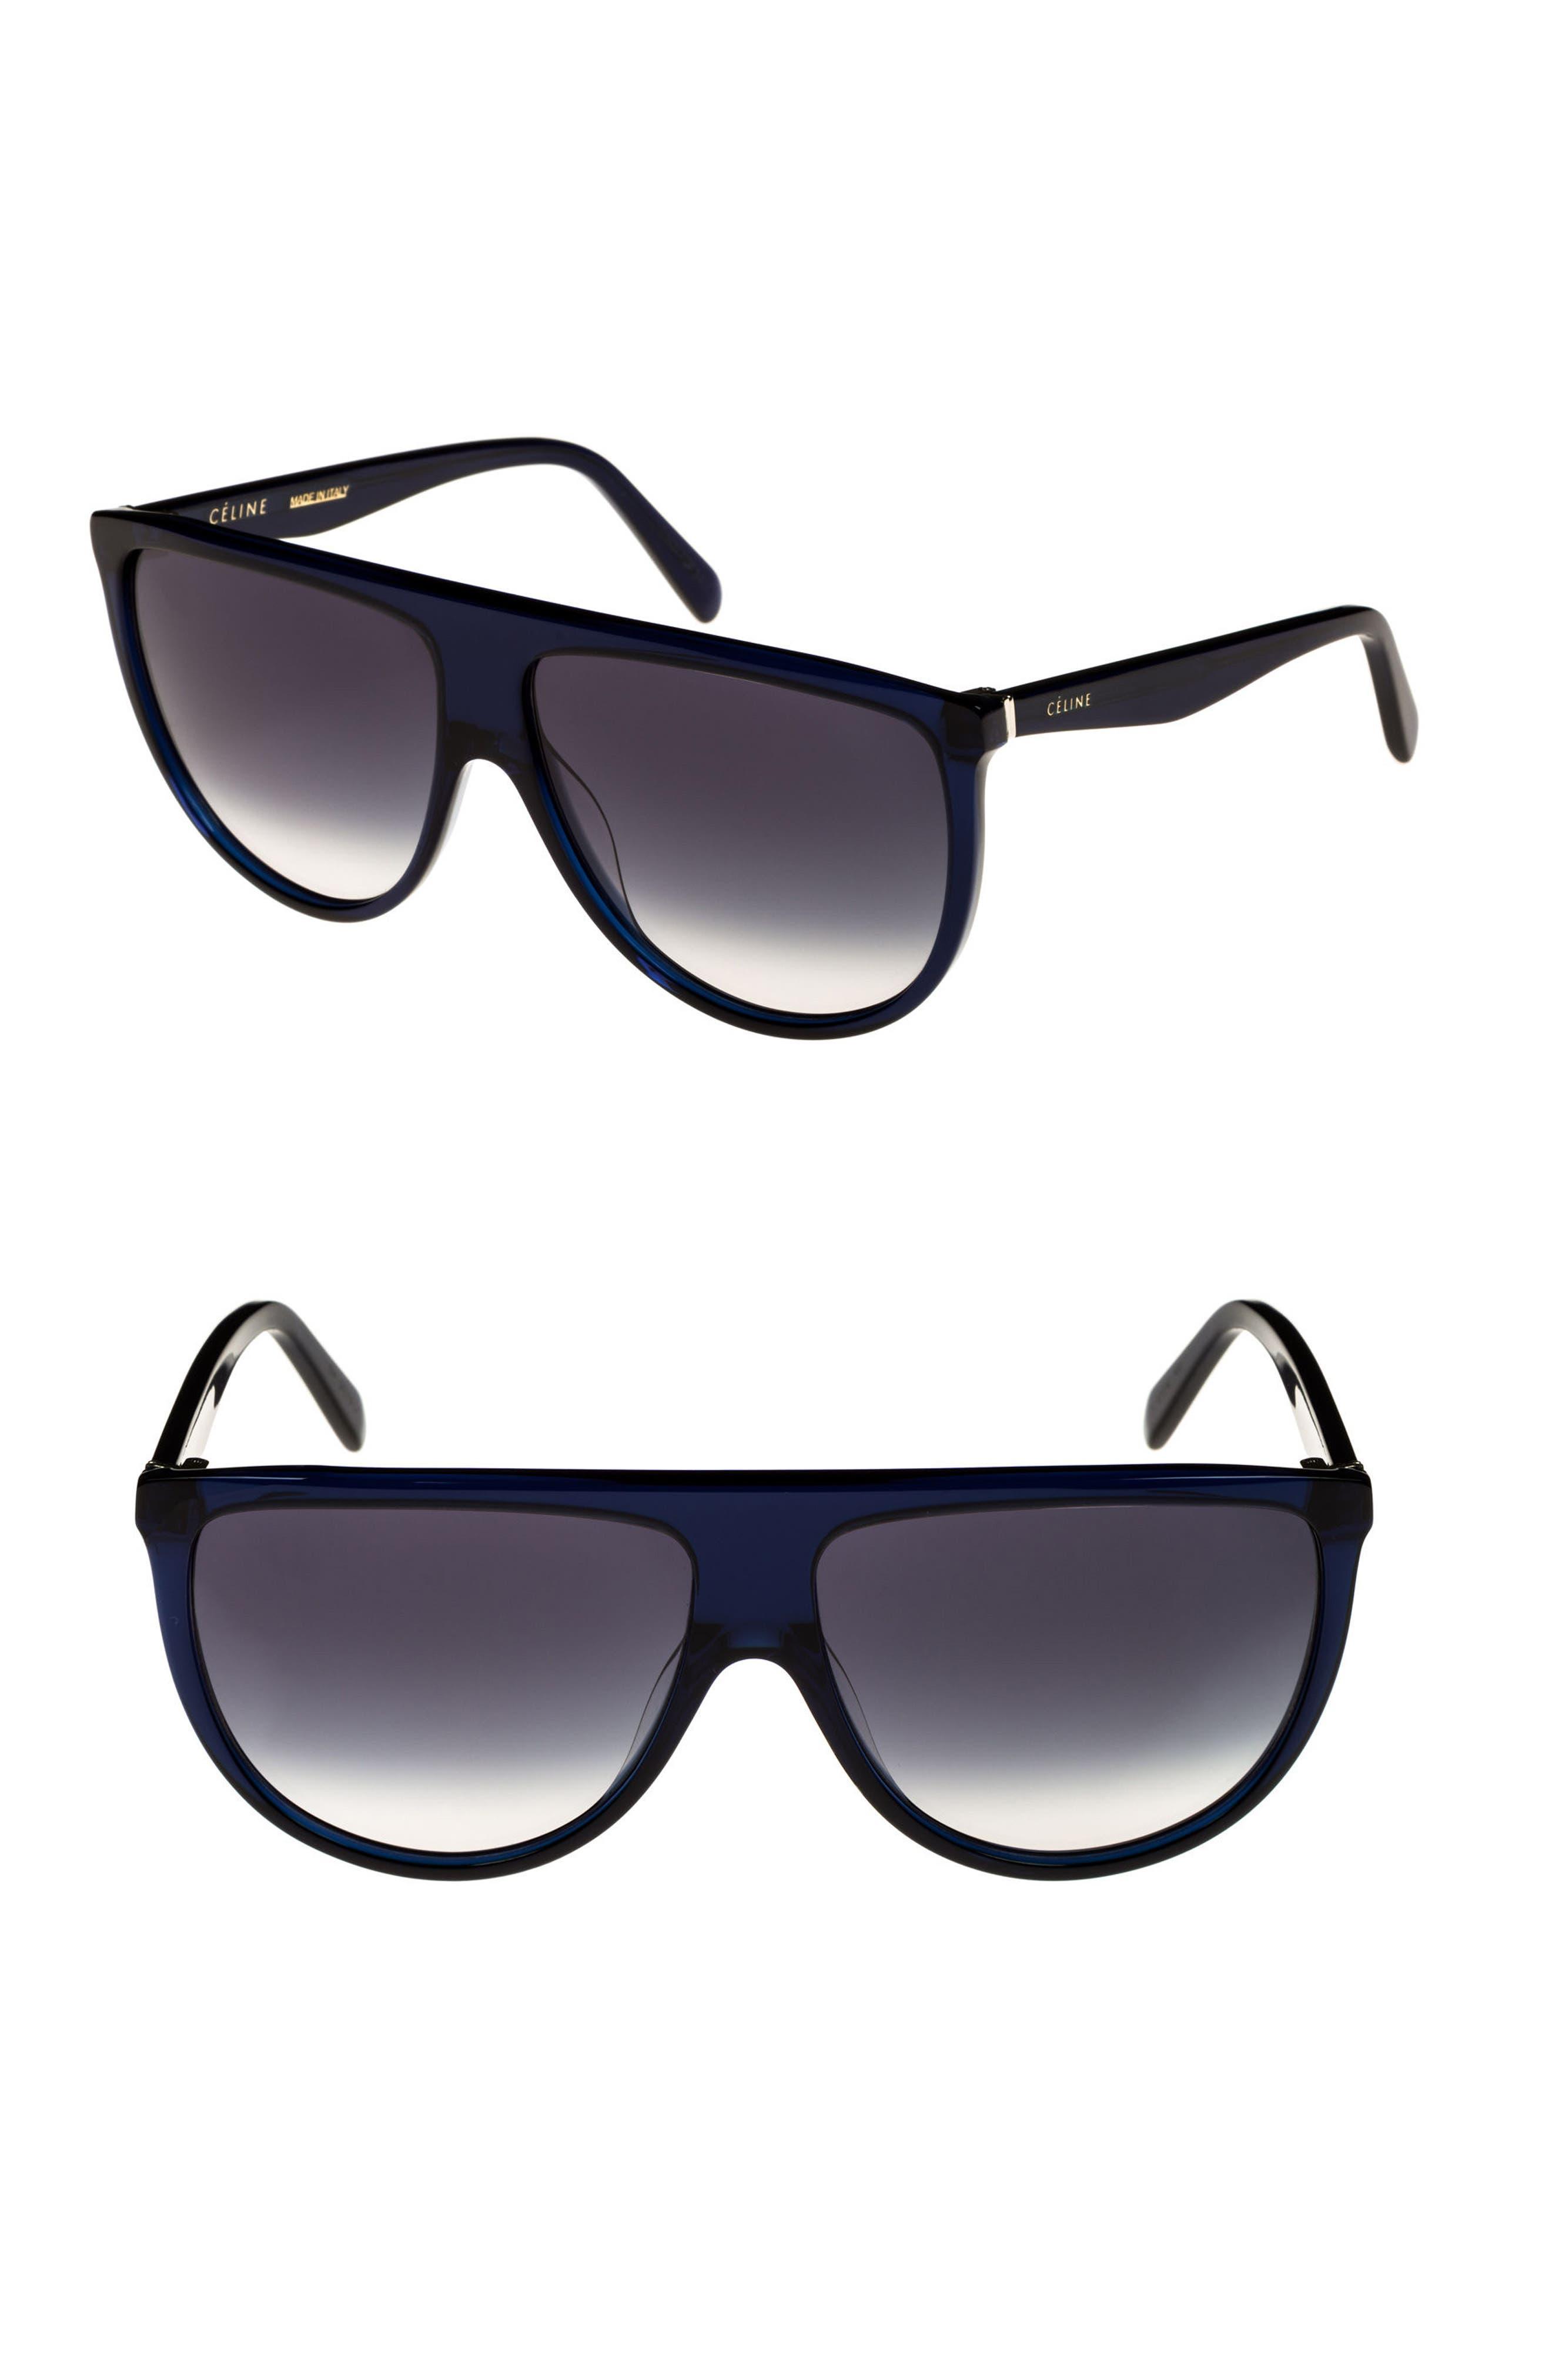 76c1fb9dfa547 CELINE. Flattop Gradient Shield International-Fit Sunglasses ...